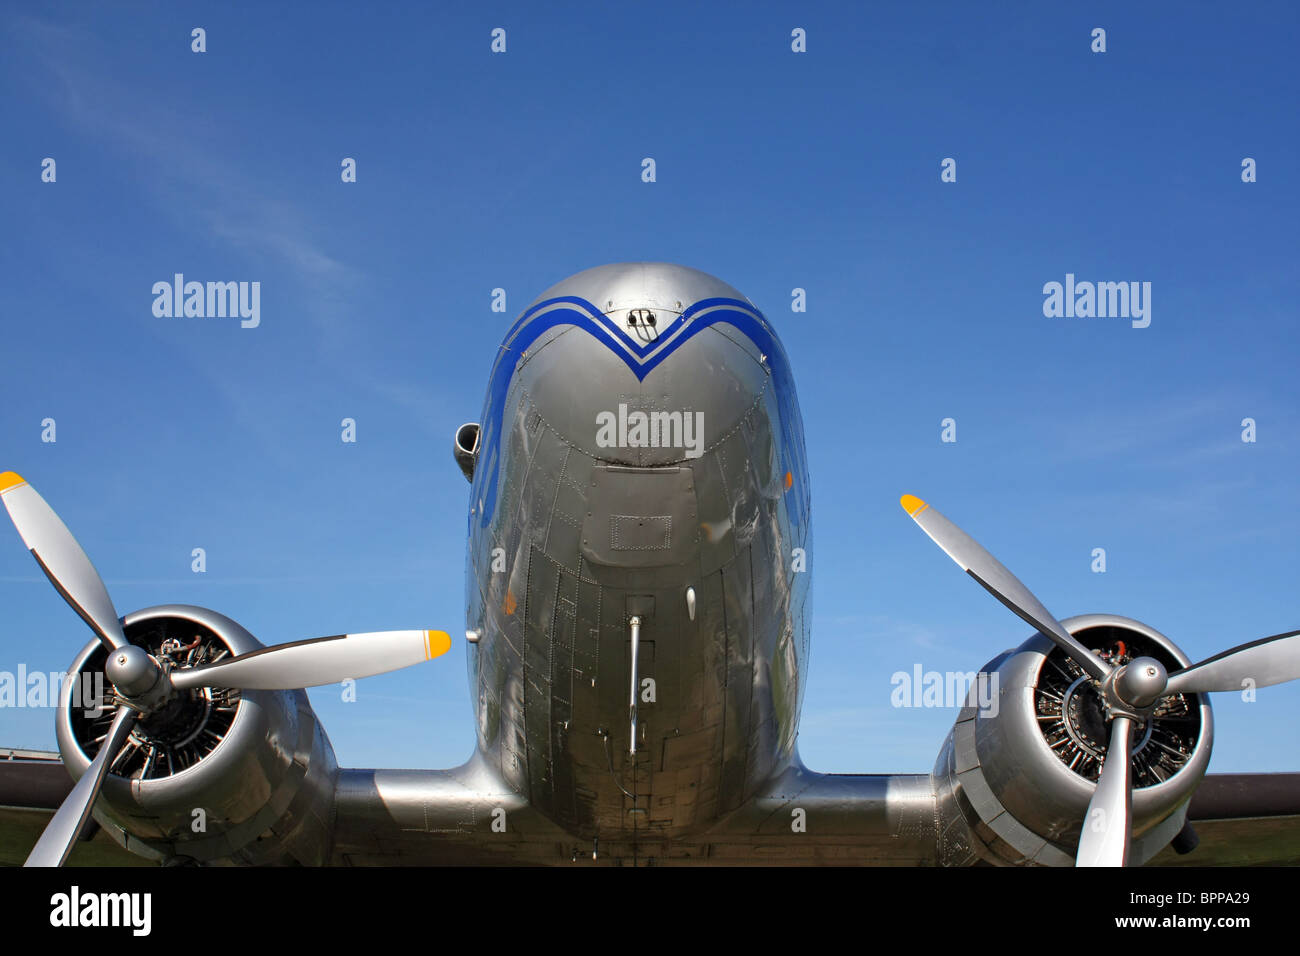 classic aircraft - Stock Image